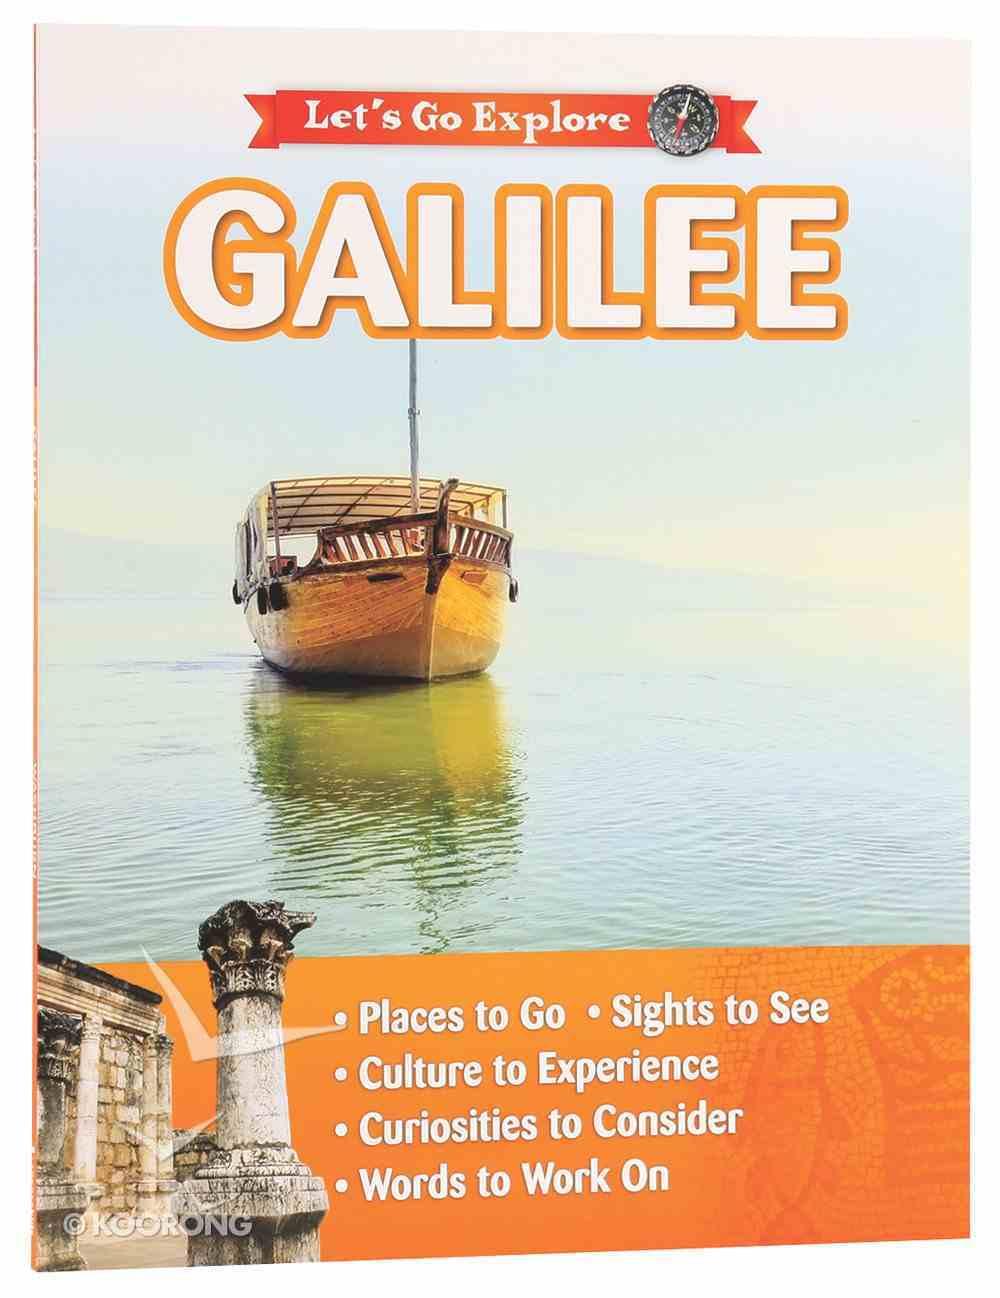 Galilee (Let's Go Explore Series) Paperback